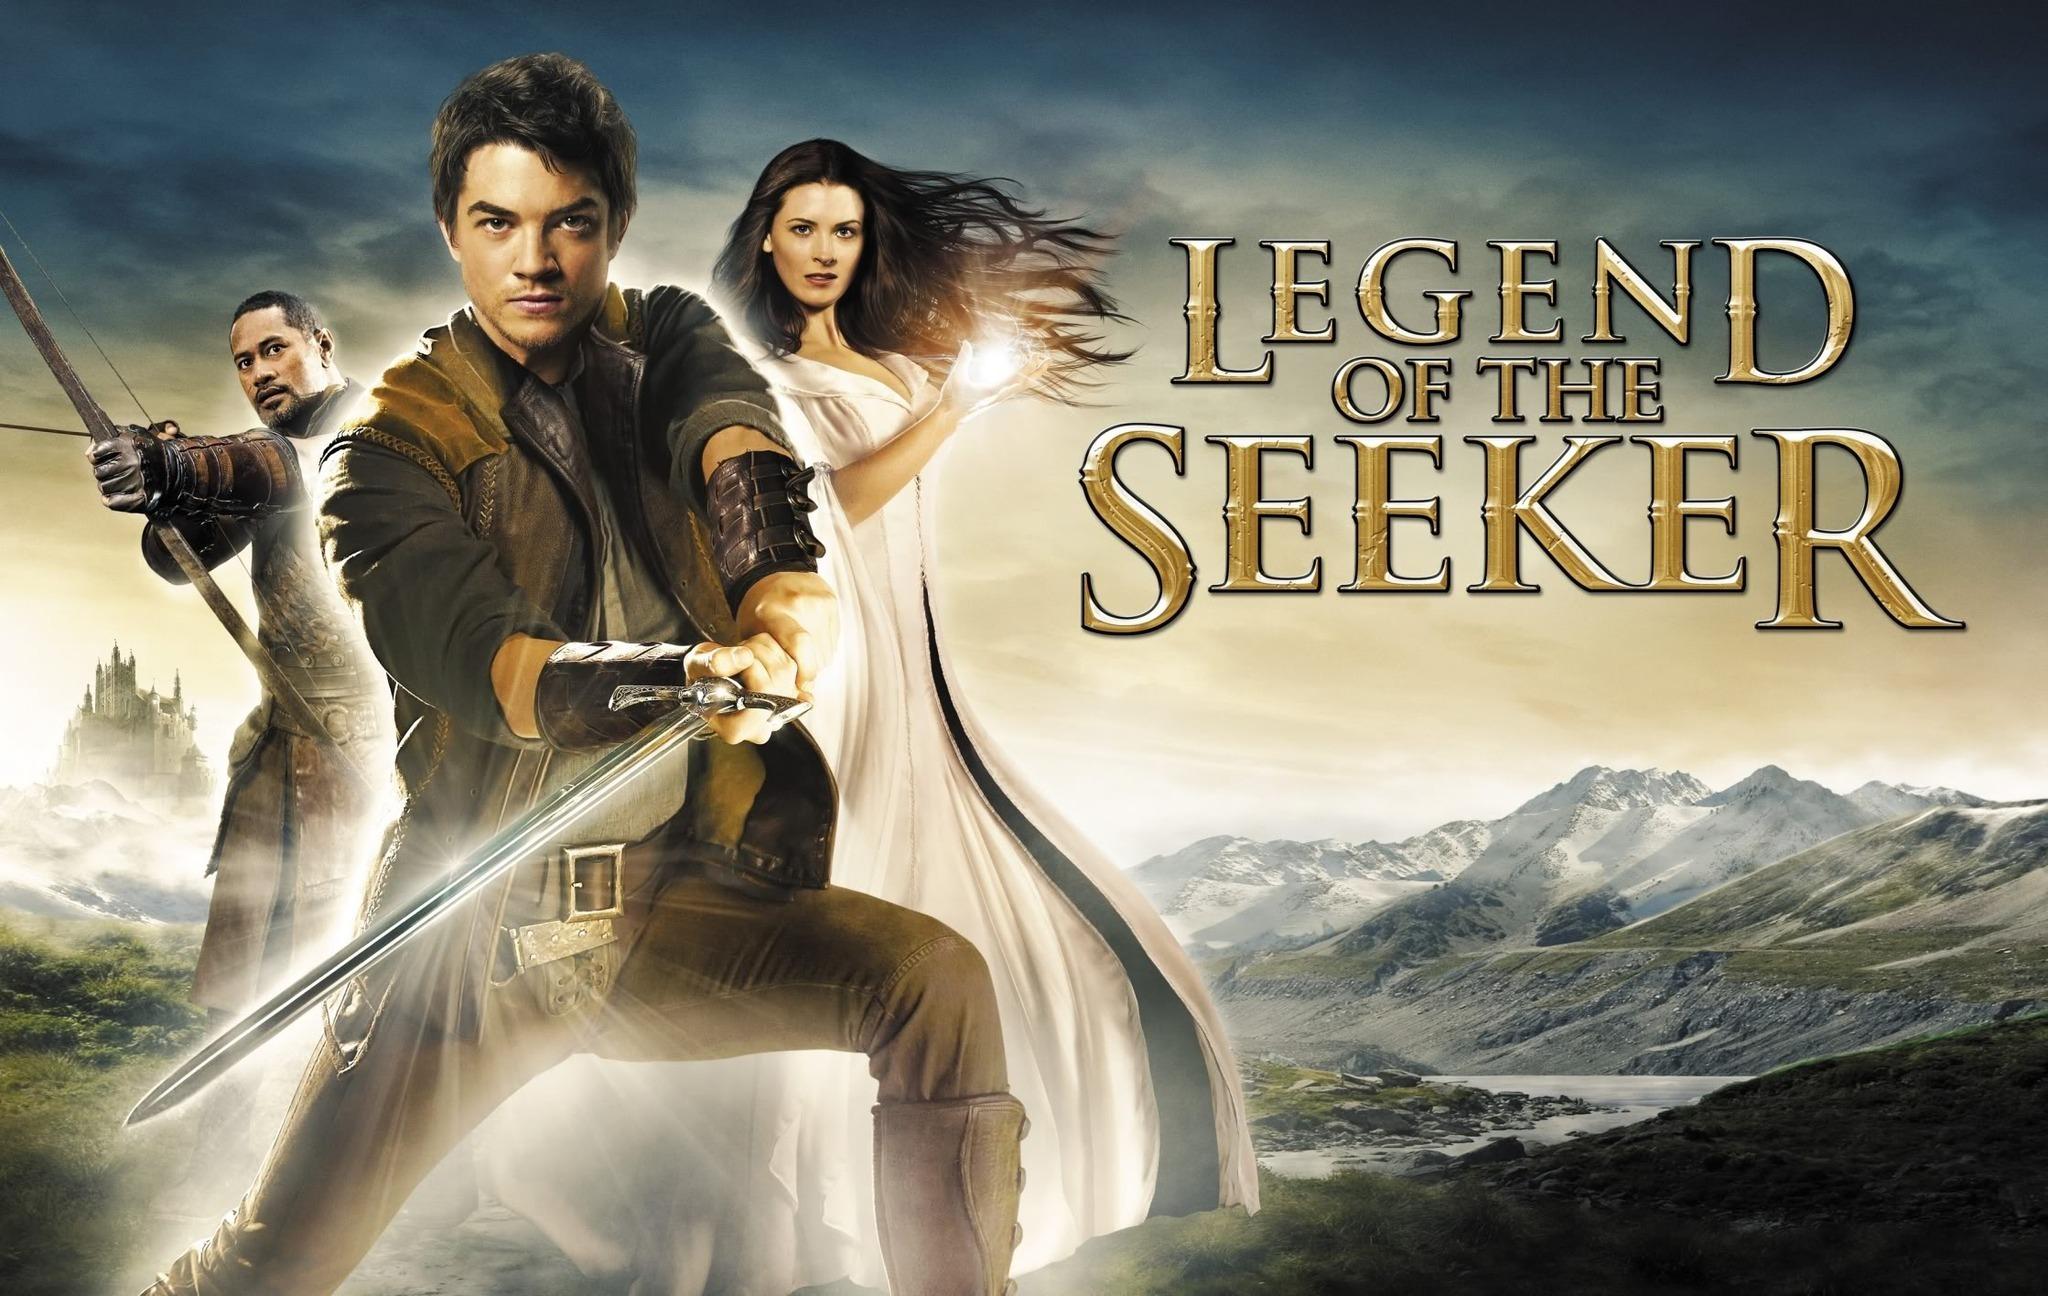 Legend-of-the-Seeker-bridget-regan-12183120-2048-1296